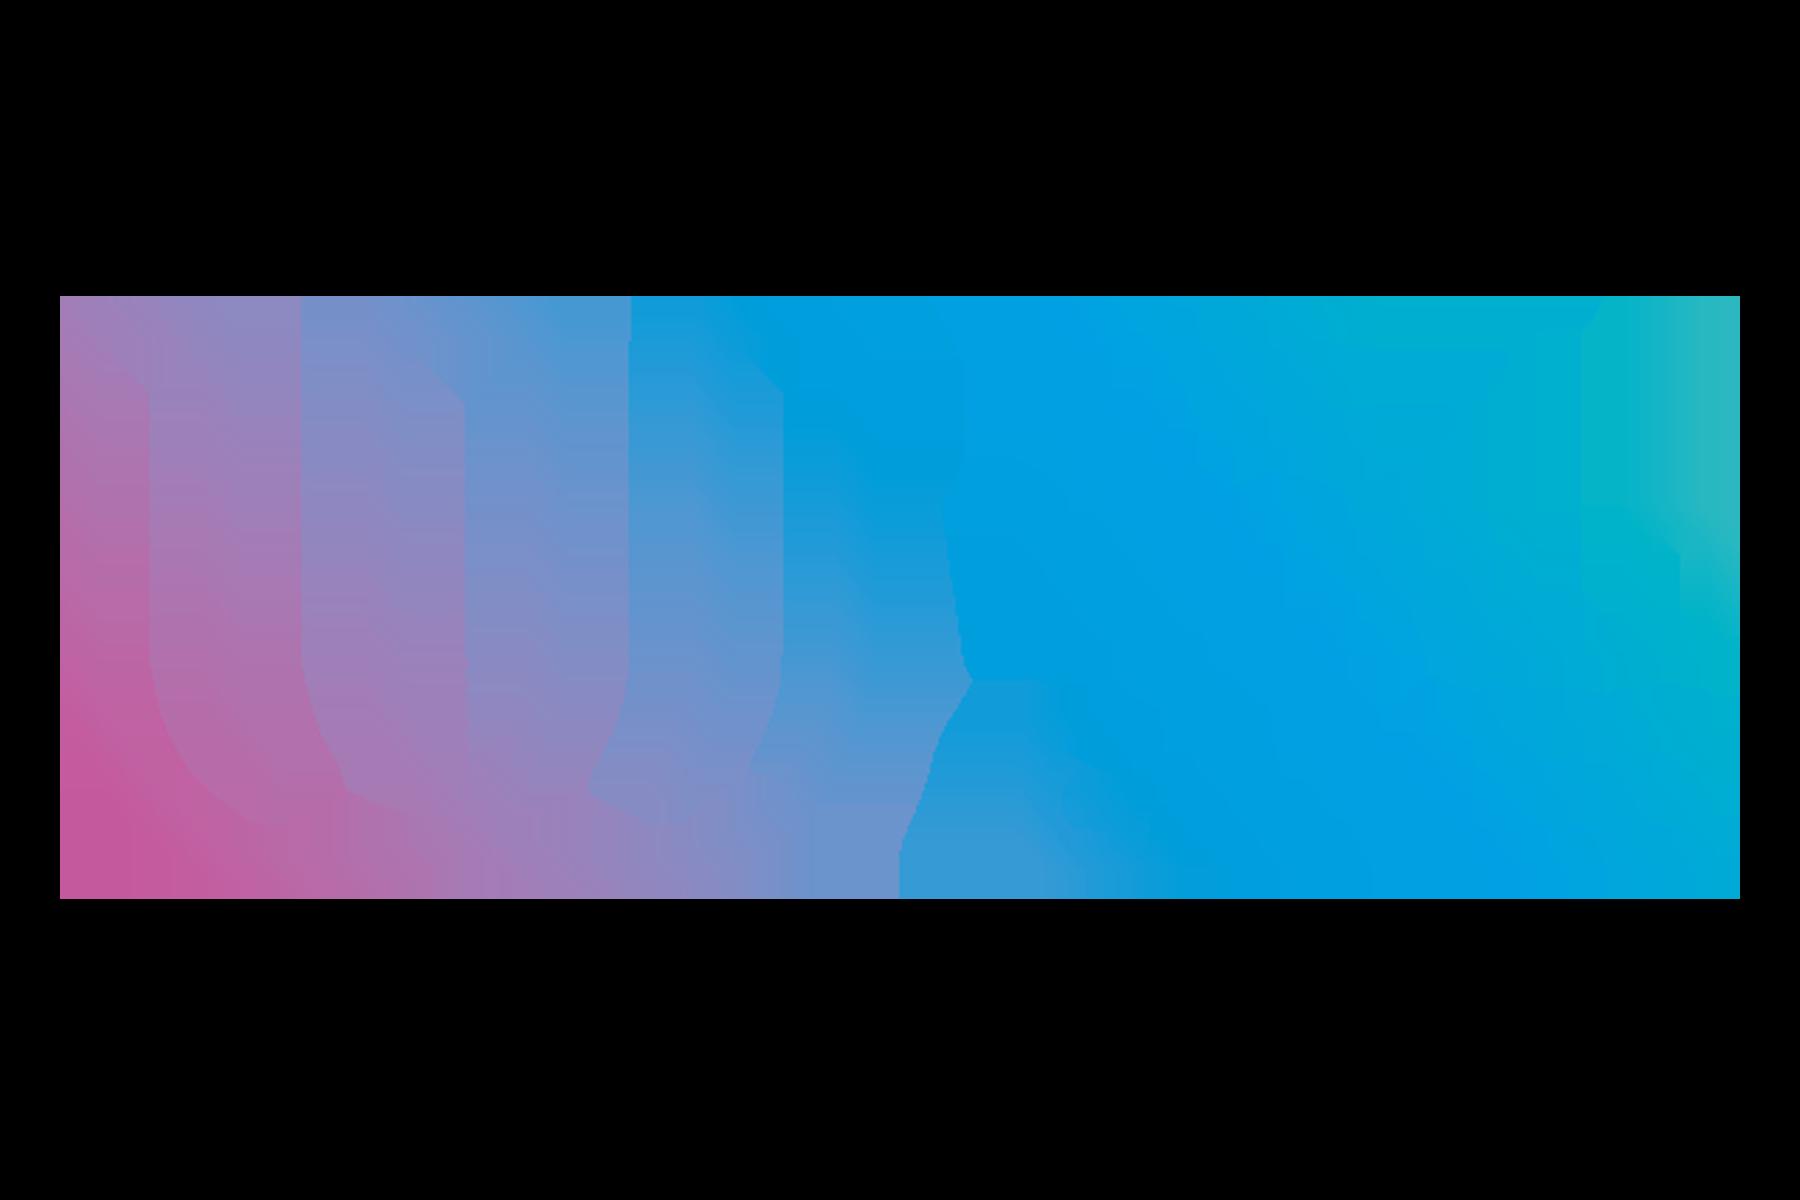 IWGA Council Meeting